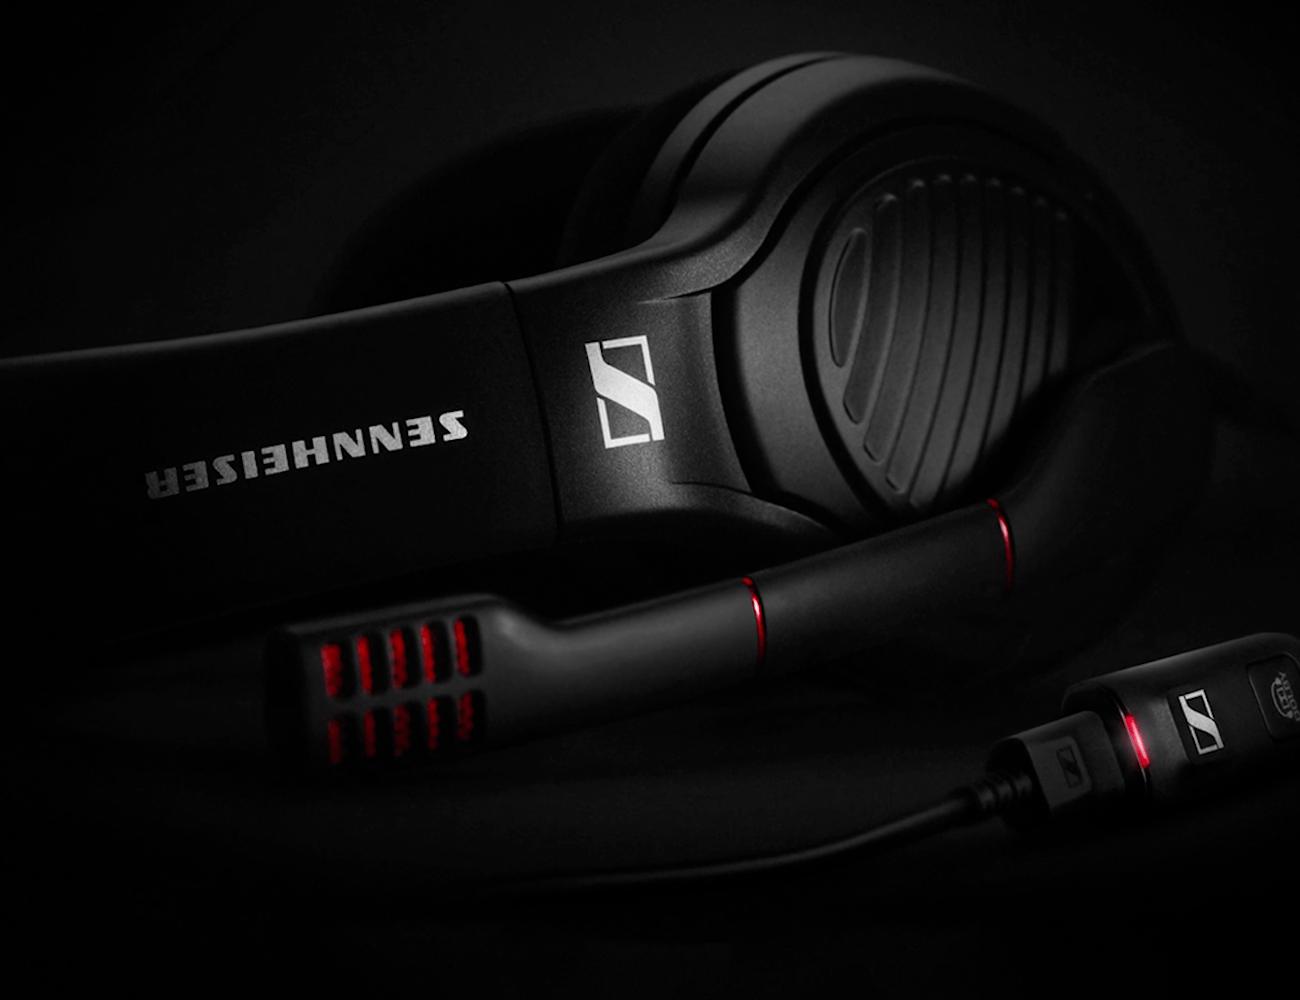 Surround Sound PC Gaming Headset by Sennheiser